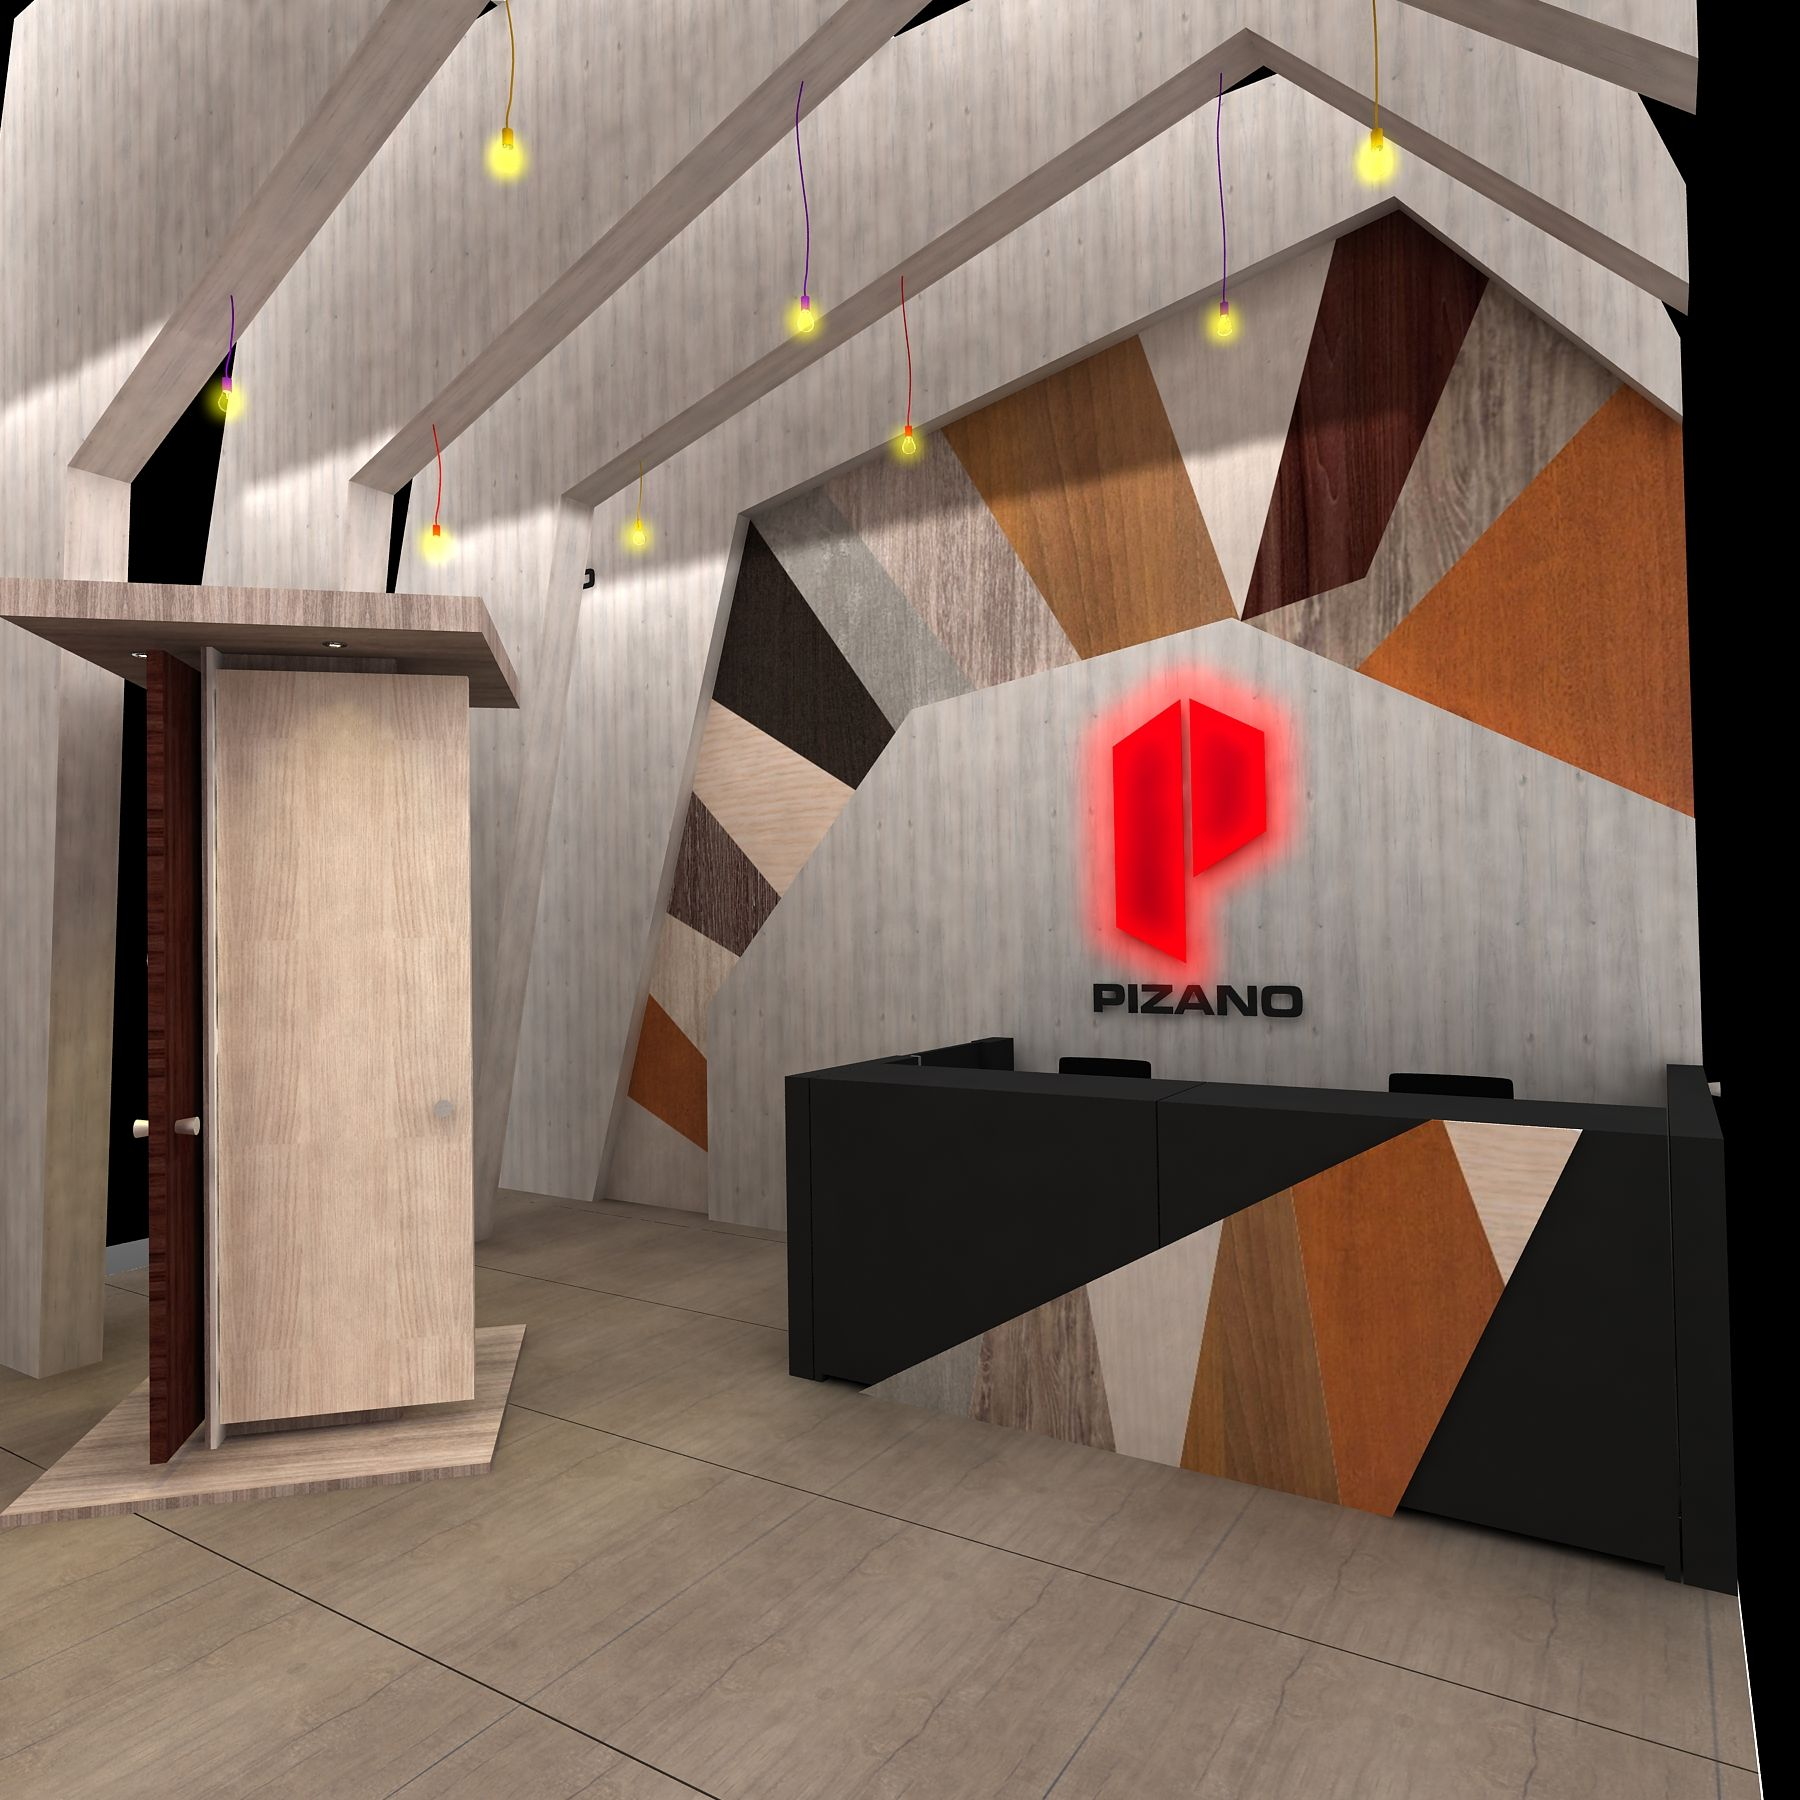 Muebles Pizano Cartagena - Stand Pizano Feria Mueble Y Madera 2016 Bogot Mitocondria Gpm [mjhdah]https://s-media-cache-ak0.pinimg.com/originals/60/33/1a/60331aa101efb14ebfaae7461971b058.jpg